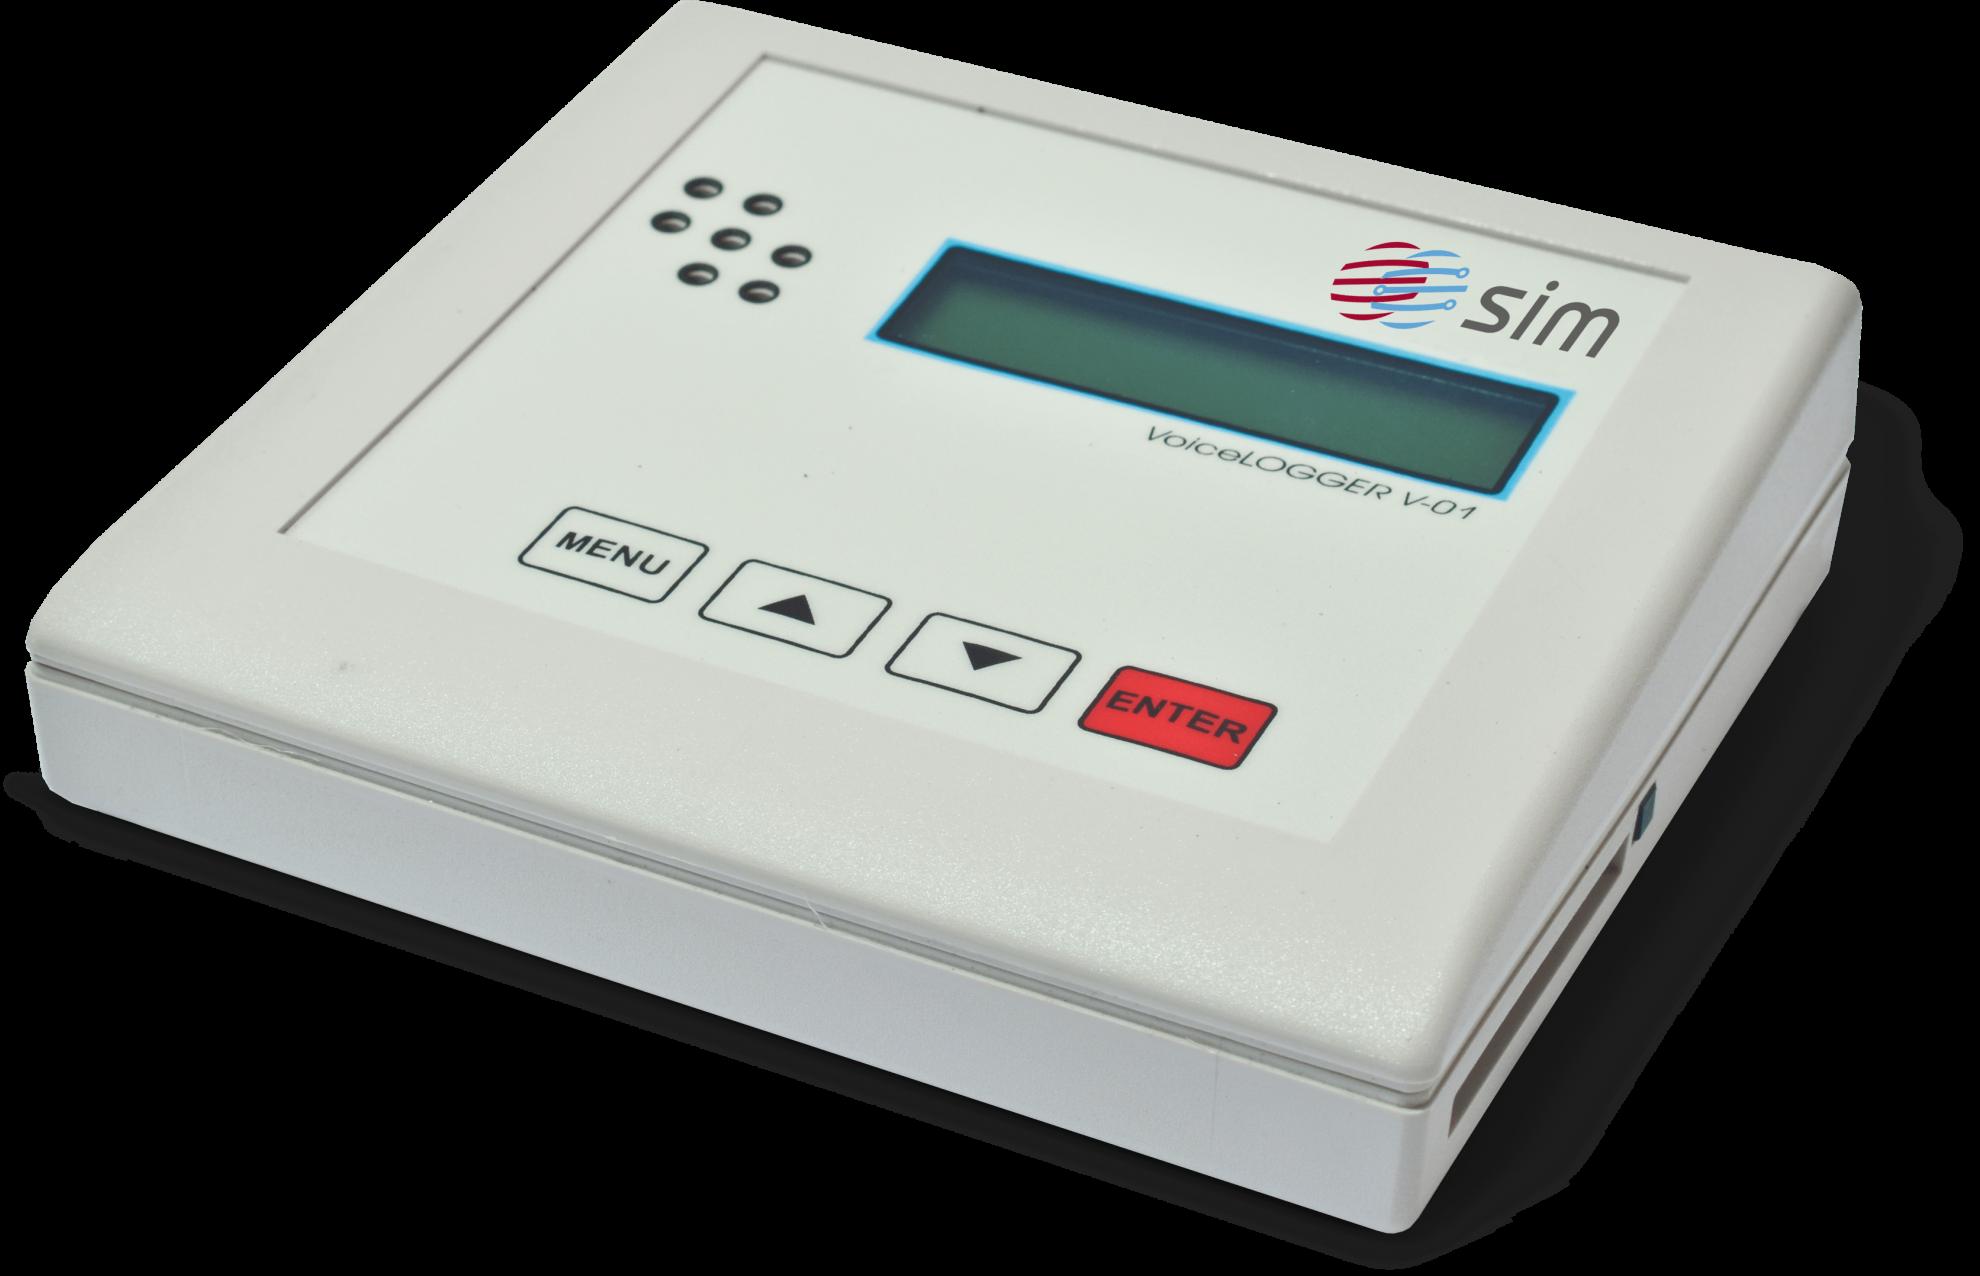 Едноканални записващи устройства на разговори VoiceLogger